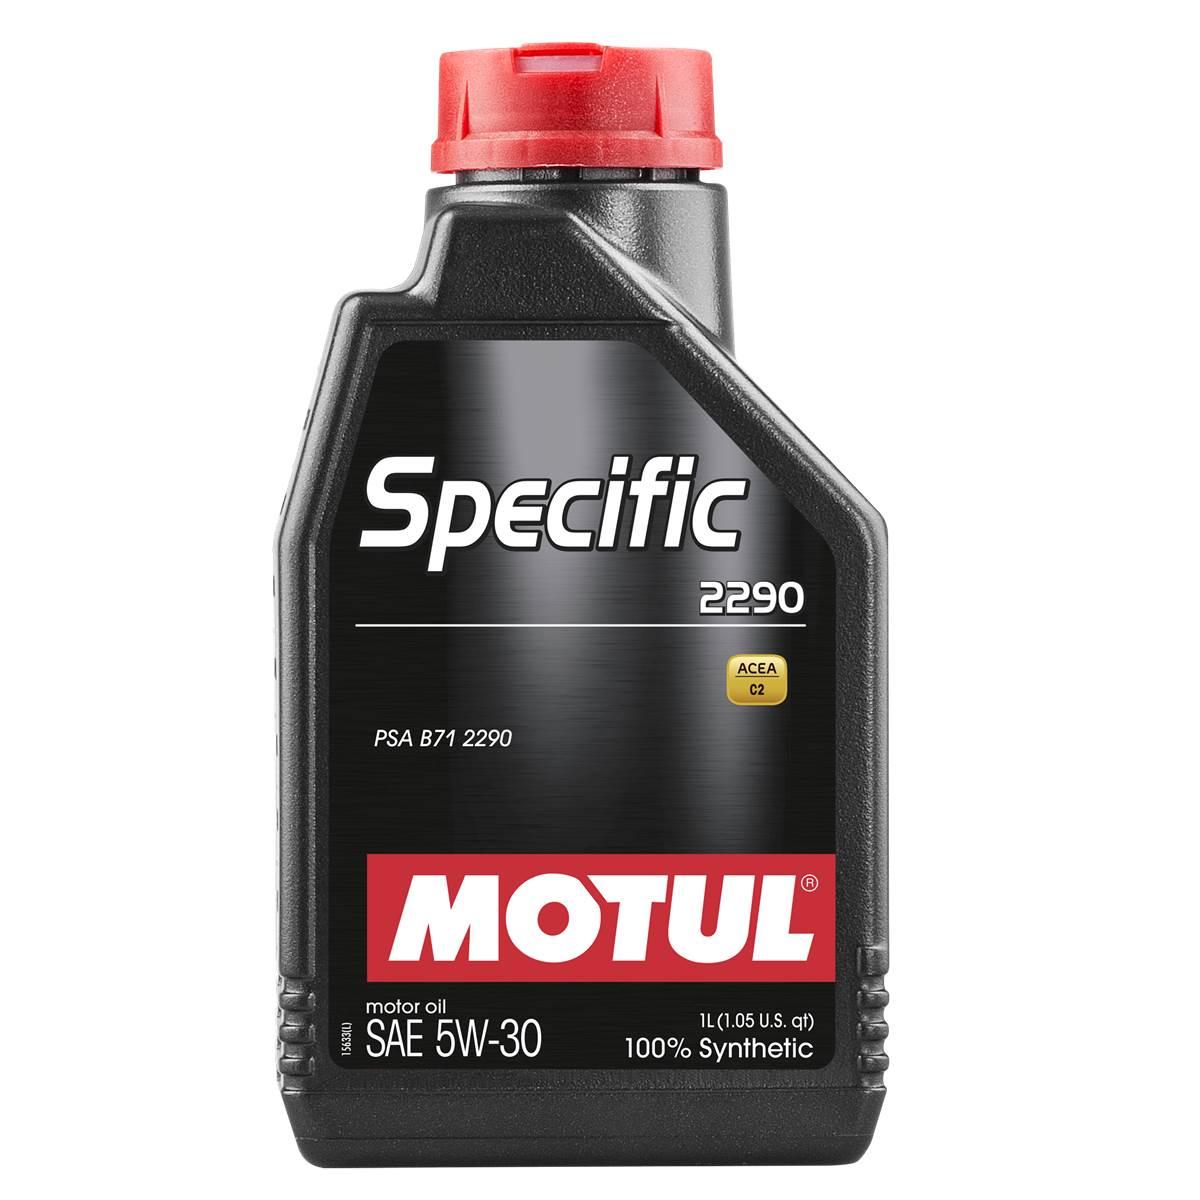 Huile moteur Motul specific 2290 C2 essence et diesel 5W30 1L